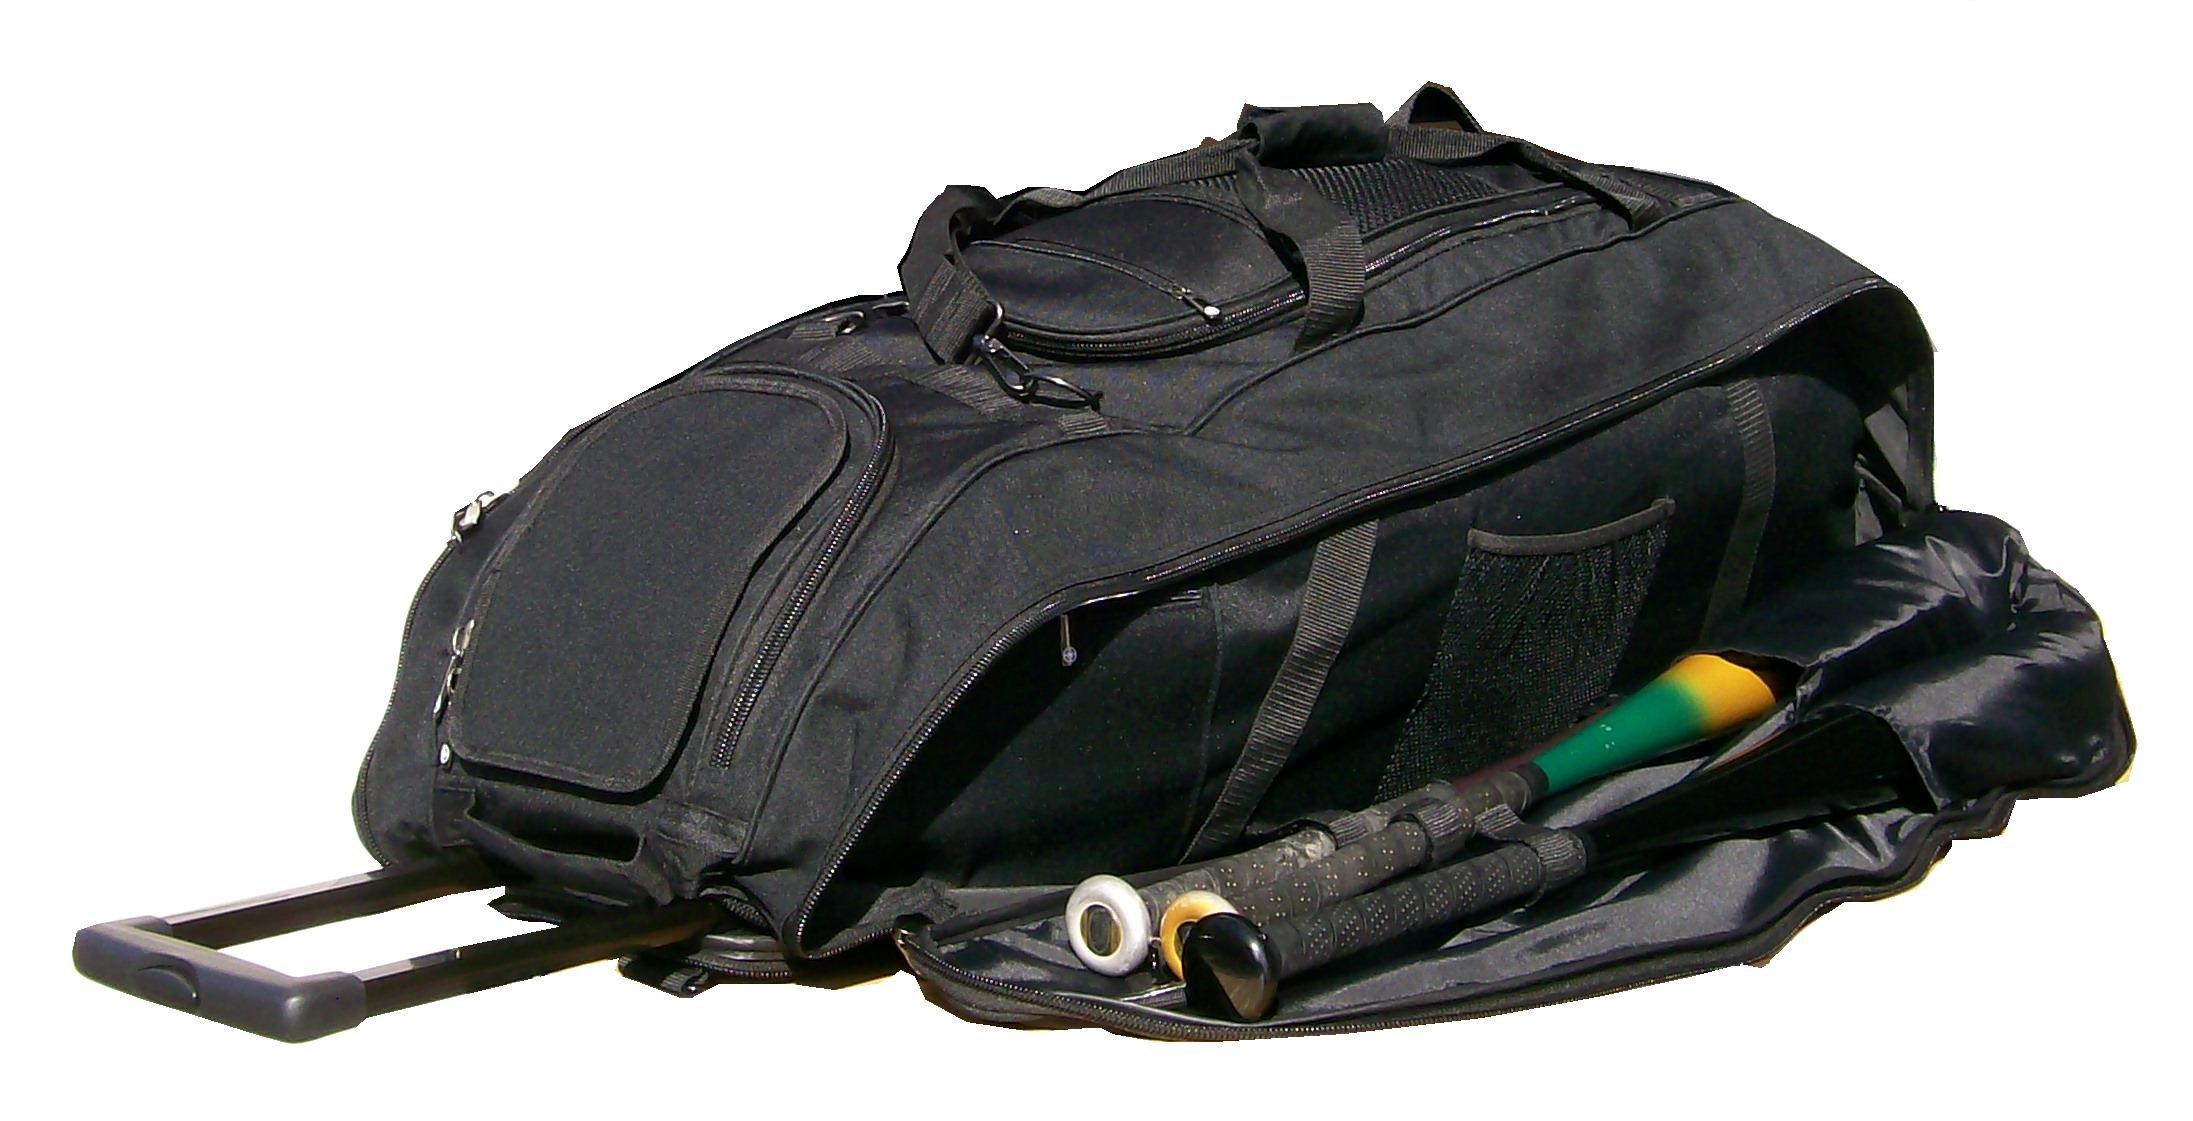 Catchers bag in Solid Black Cobra XL III Three wheels Softball Baseball Bat Equipment Roller Bag